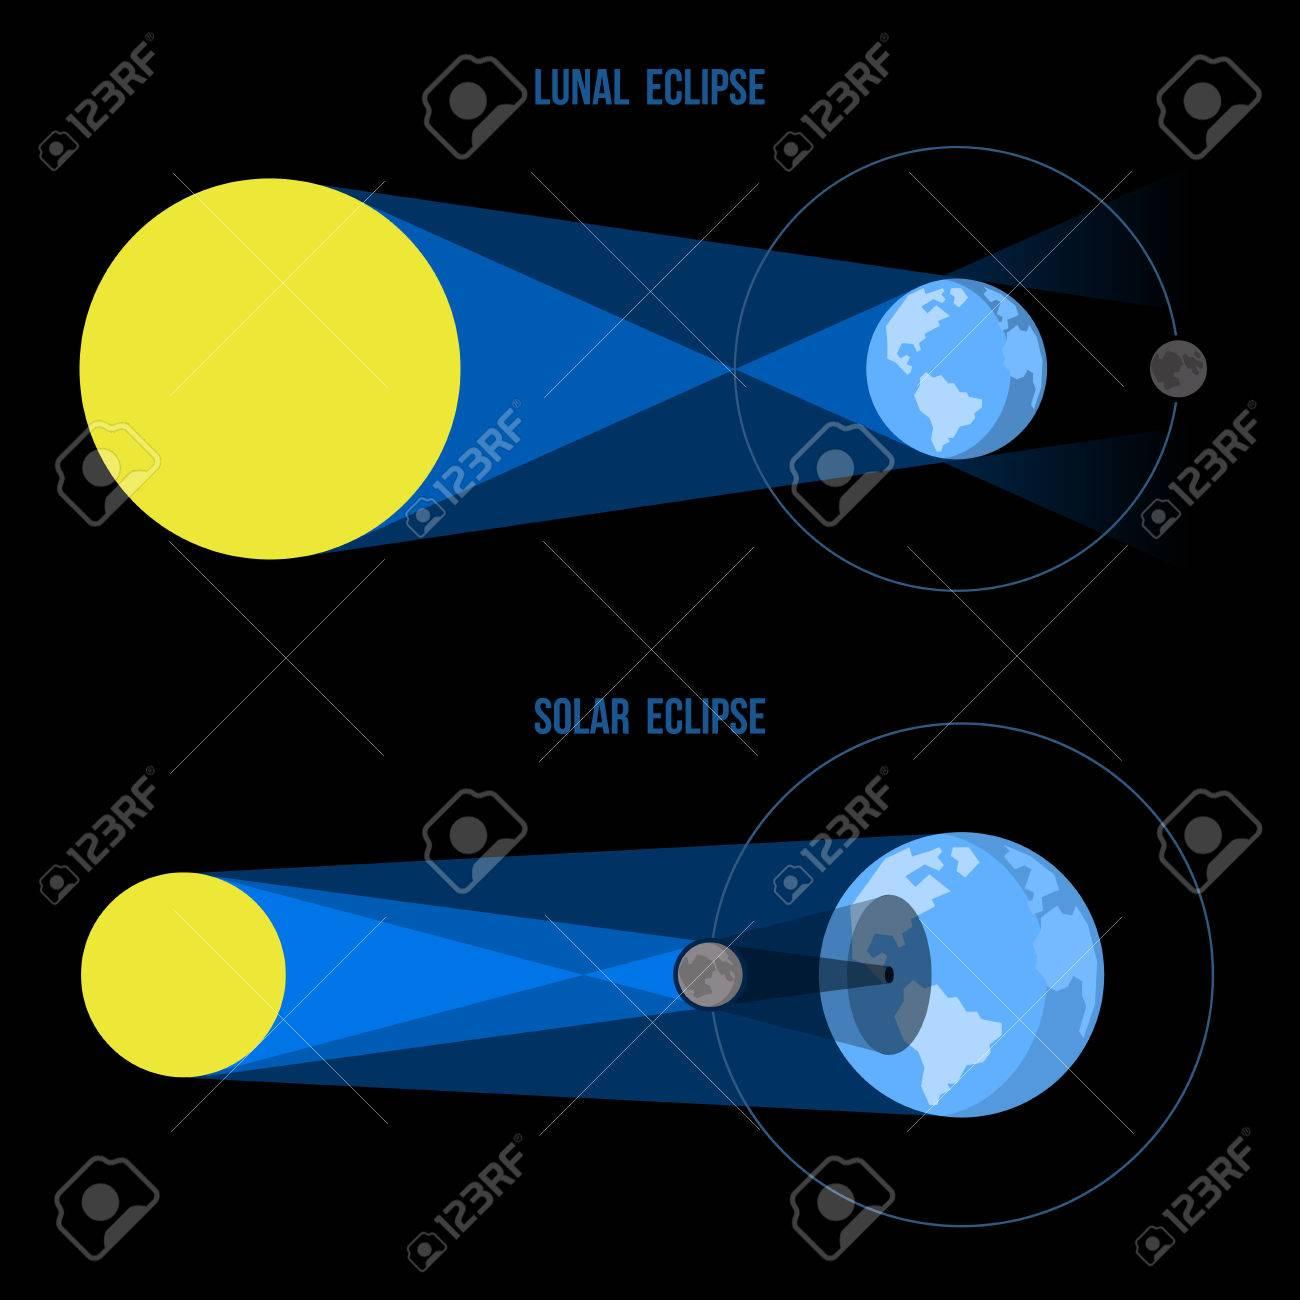 Eclipse Clipart moon eclipse 3.